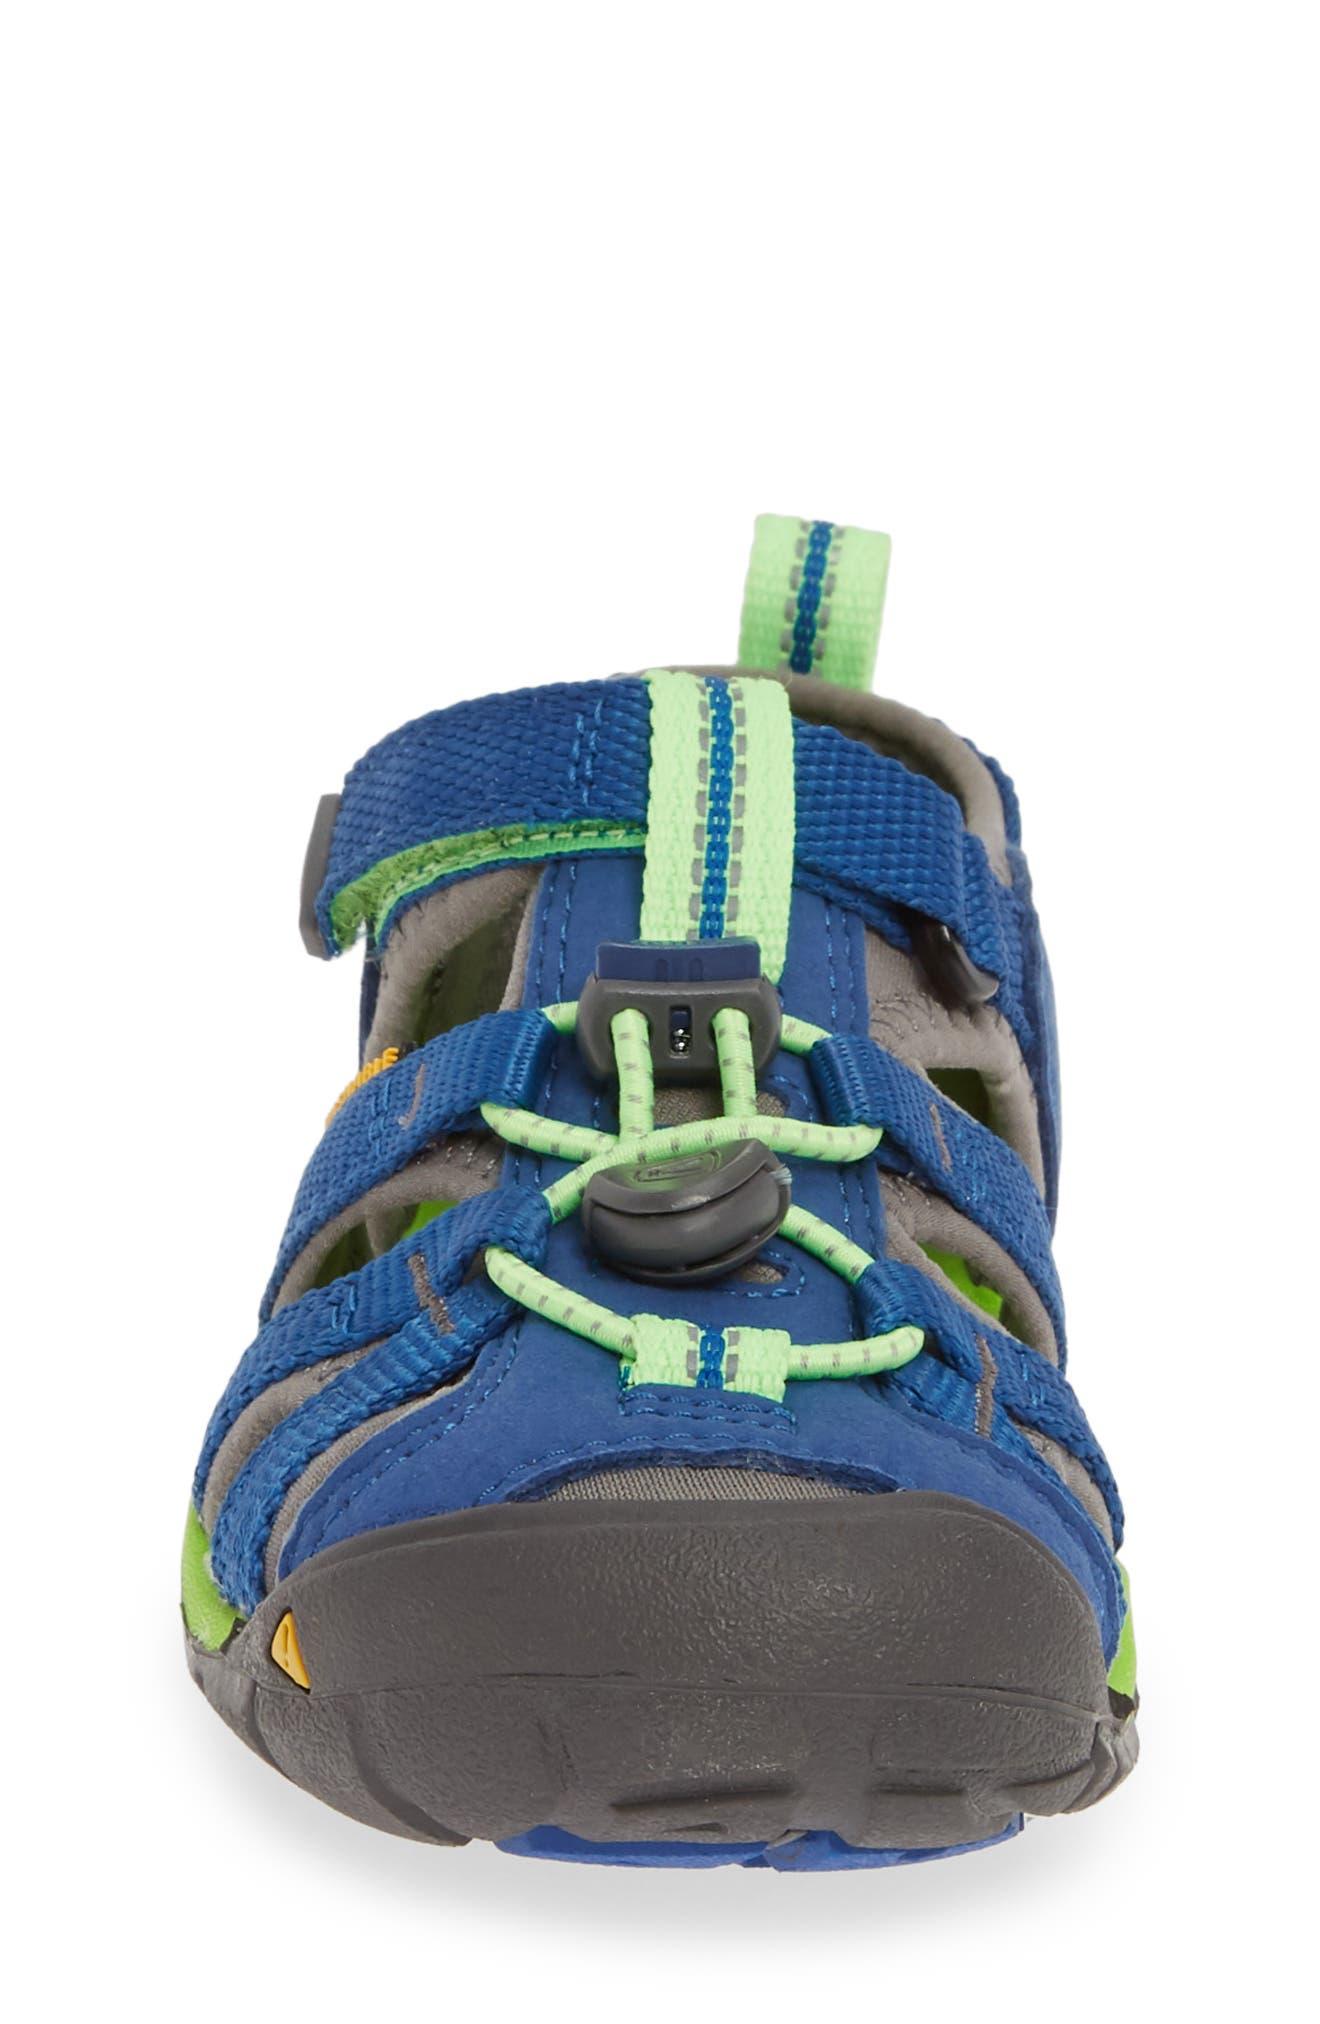 ,                             'Seacamp II' Water Friendly Sandal,                             Alternate thumbnail 164, color,                             403